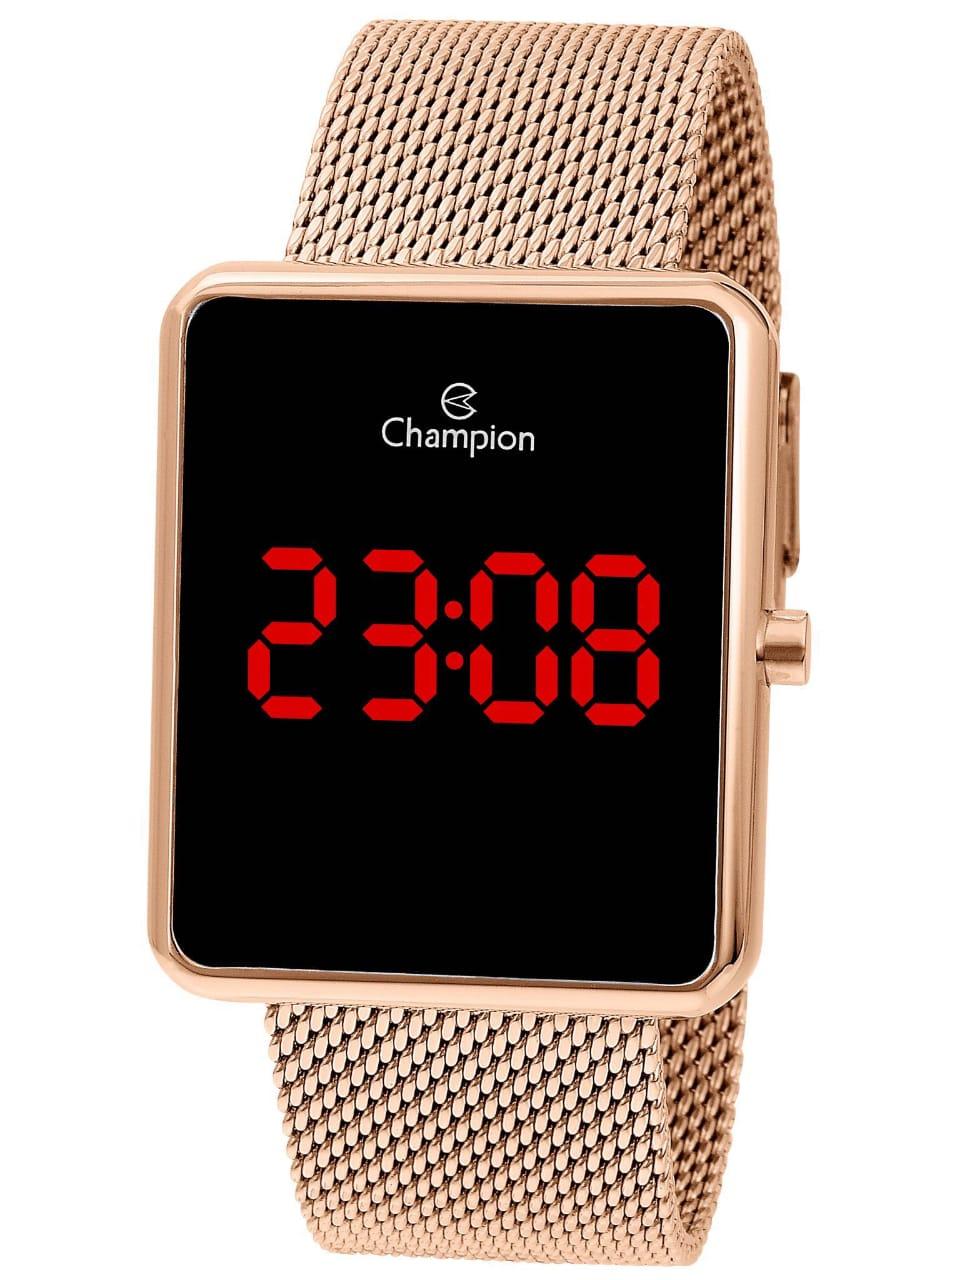 Relógio Digital Champion - Dourado Rose